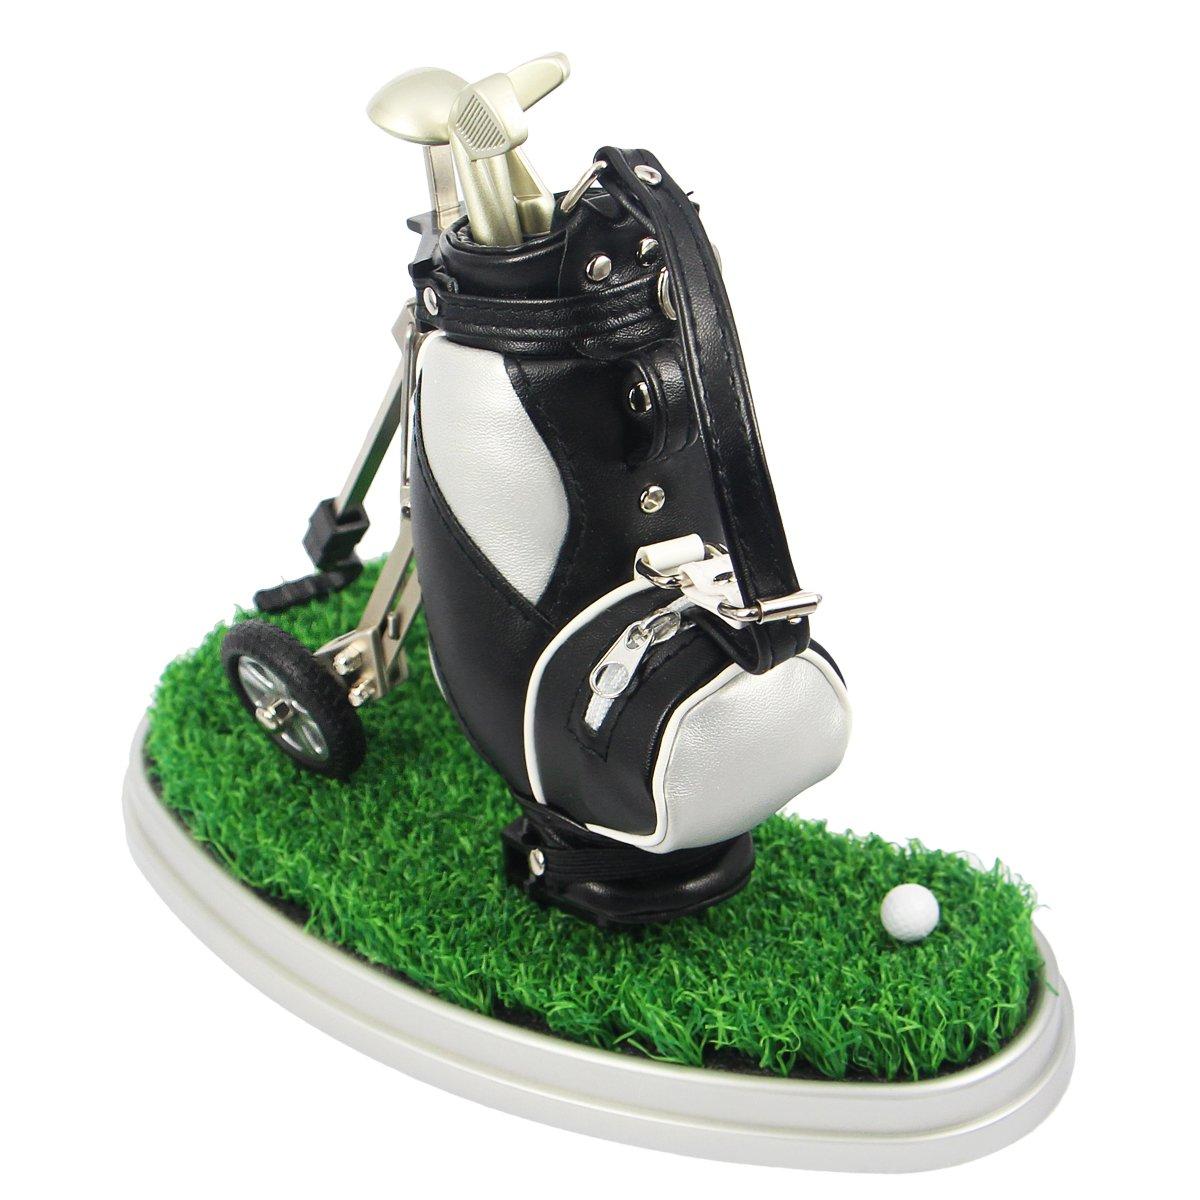 HKOO Golf Gift Golf Pens Holder,Golf Pens with Golf Bag ... Model Golf Bag Cart Pen Holder on golf cart trophy, forklift pen holder, golf cart tape dispenser, golf cart organizer, golf bag pen holder, golf cart radio, golf cart mugs, golf cart batteries, golf cart keychain, golf cart bags, golf cart tray,